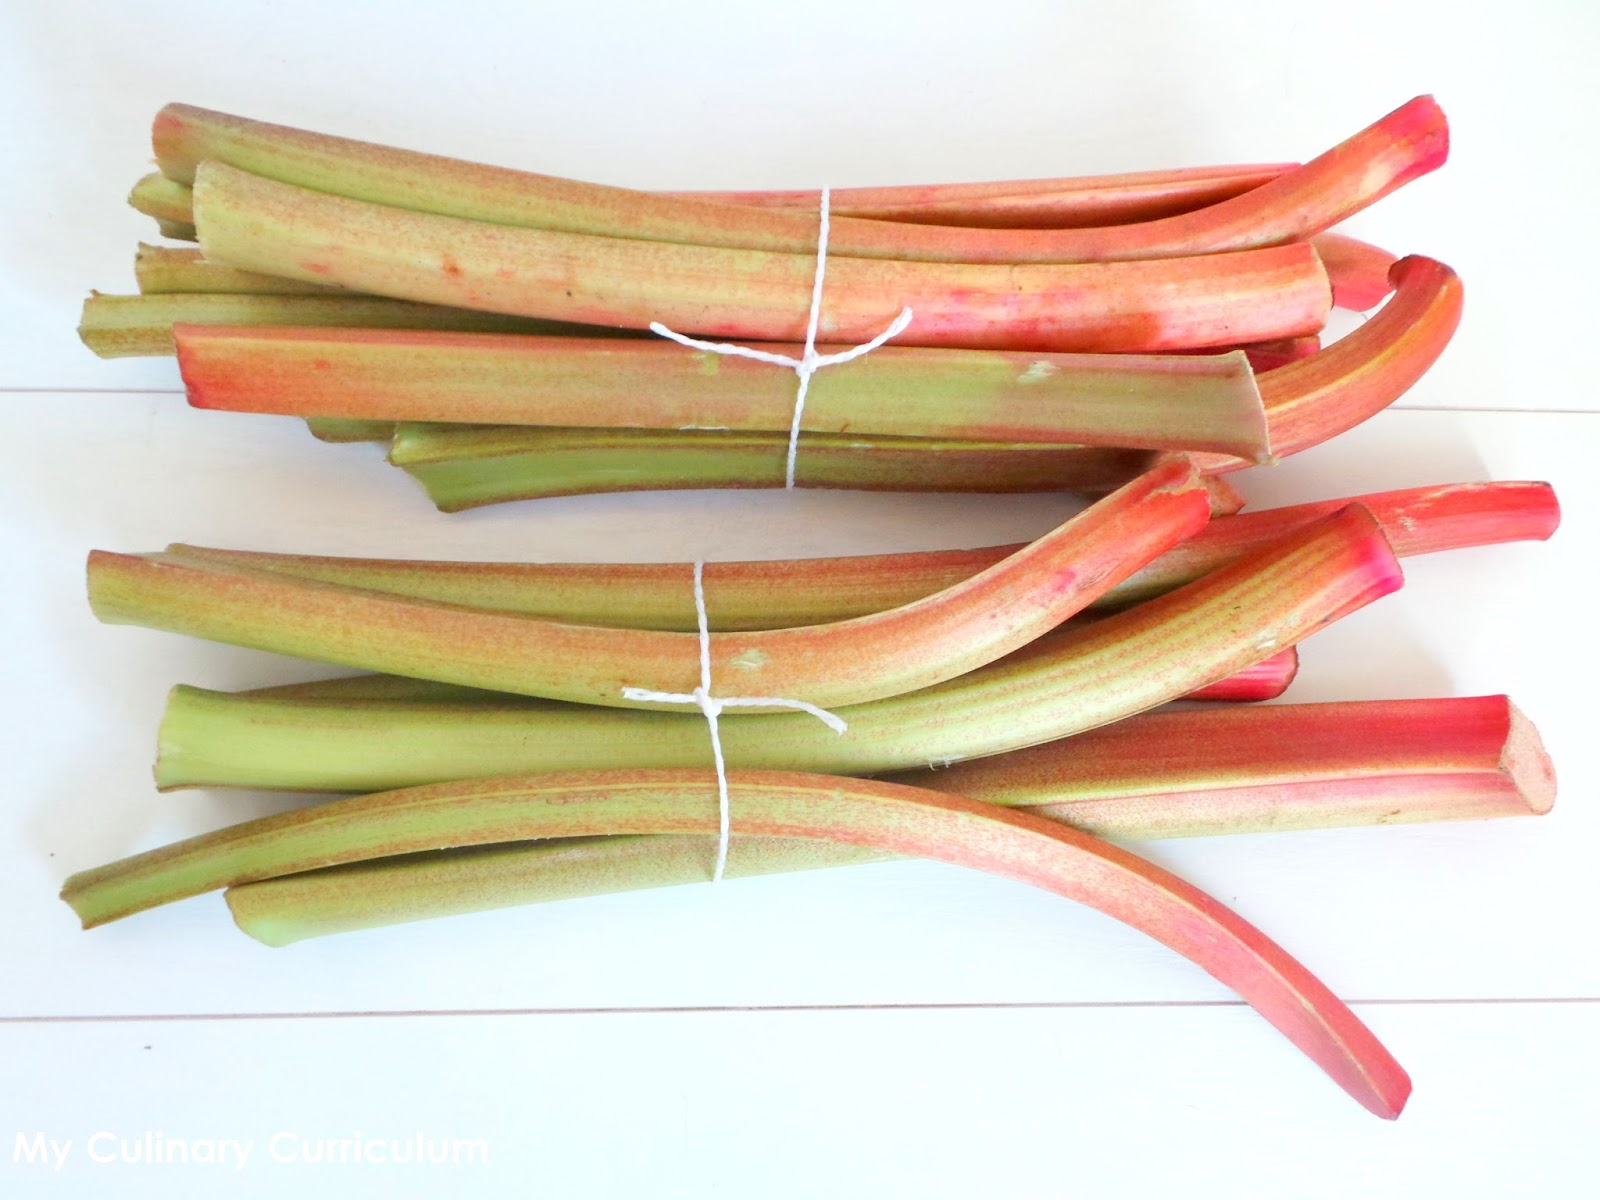 confiture de rhubarbe cook expert